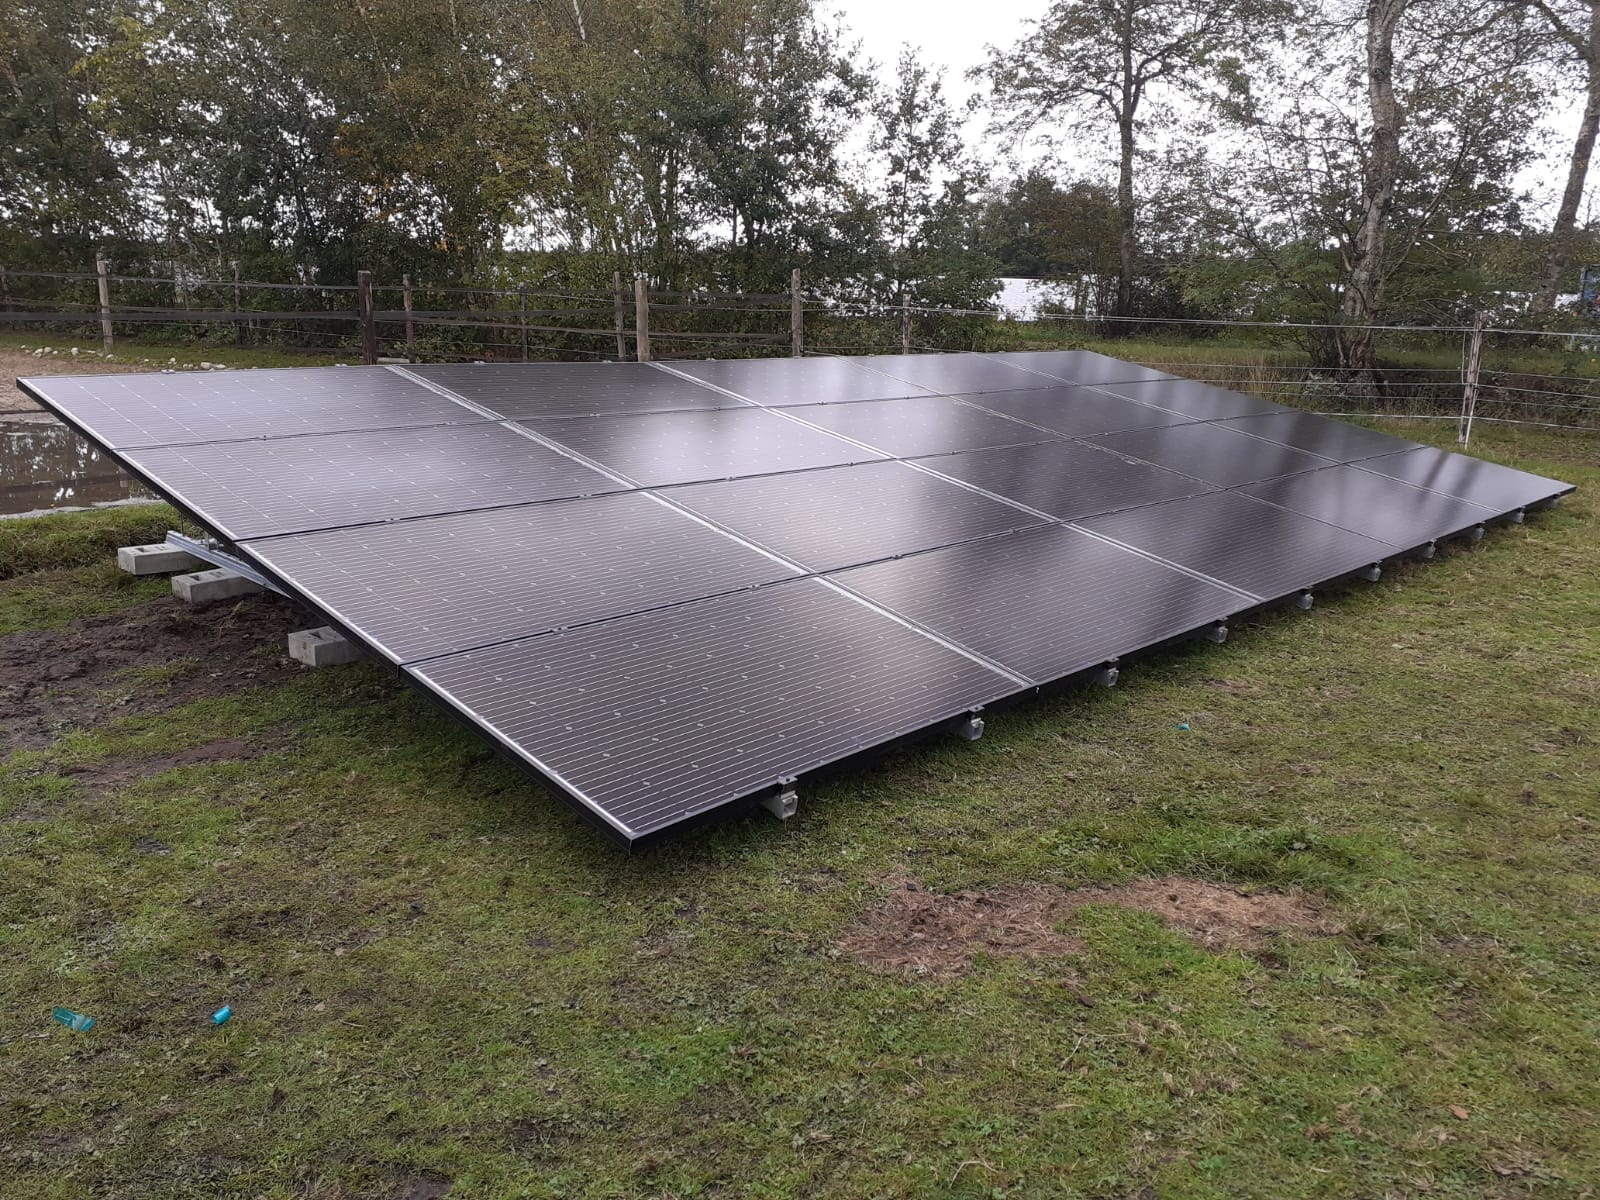 Solarwatt glas-glas zonnepanelen Fluitenberg